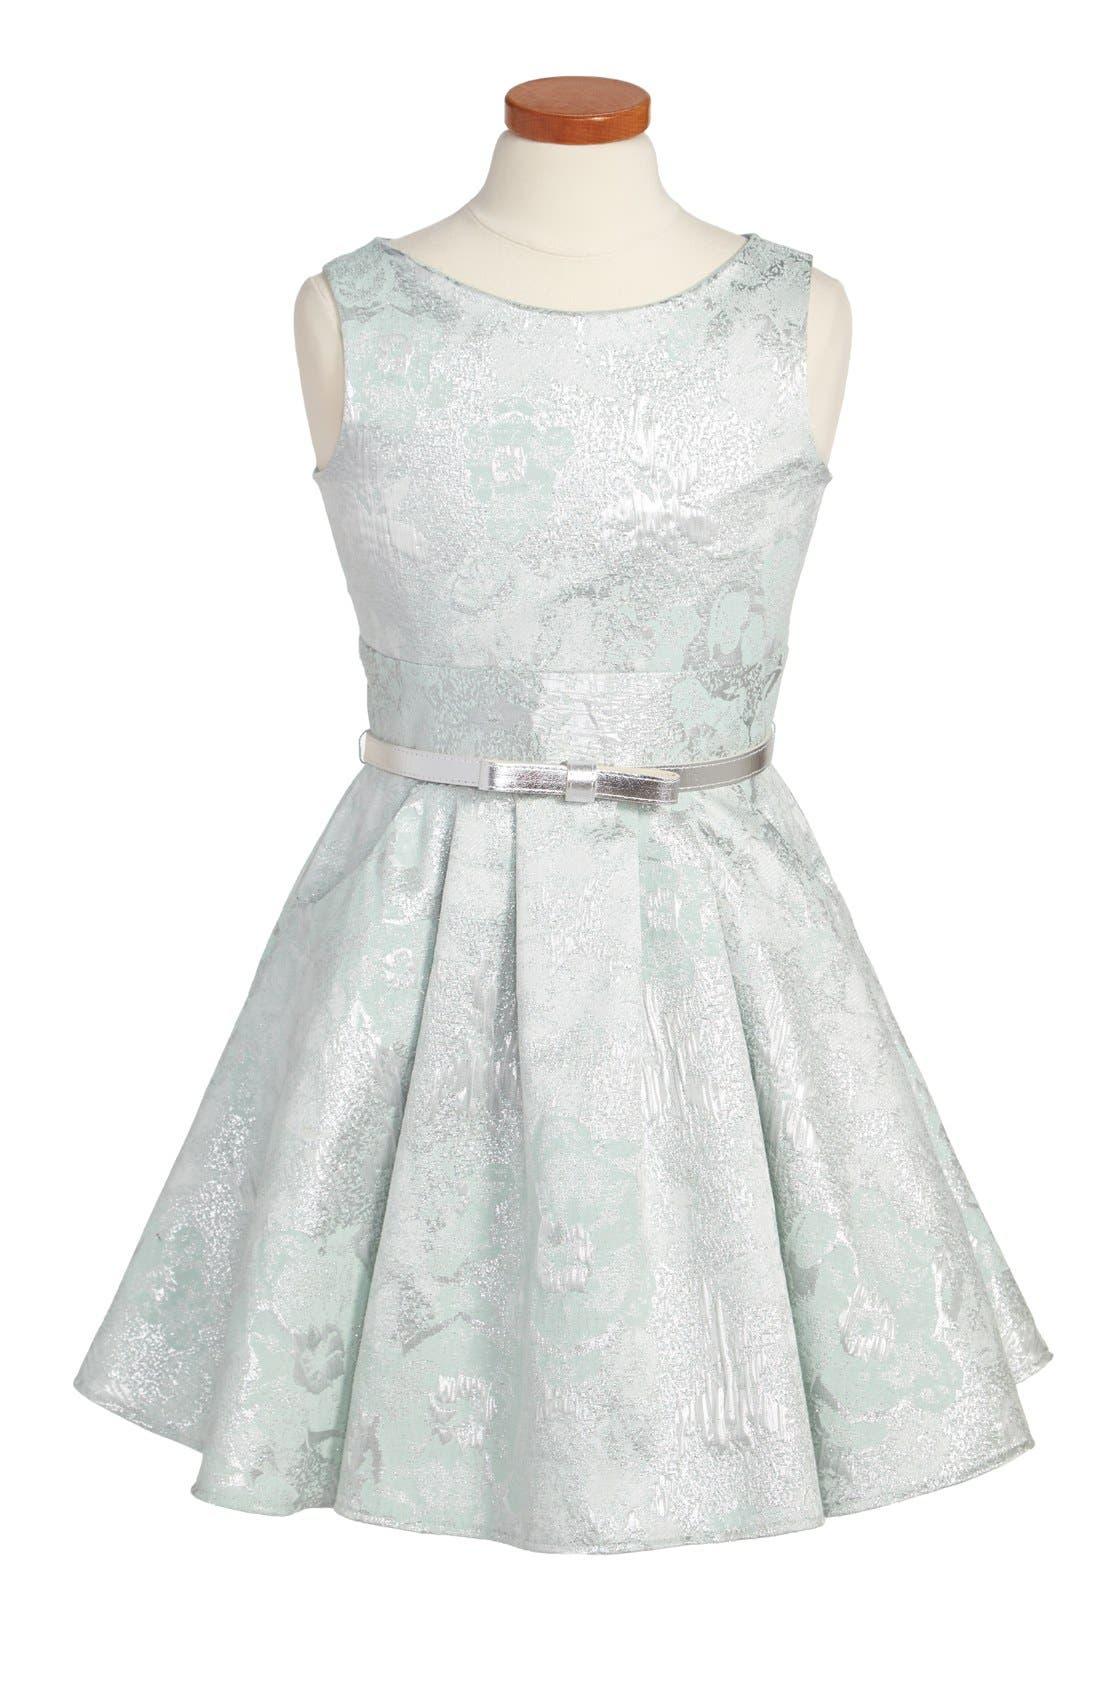 Alternate Image 1 Selected - Zoe Ltd Metallic Brocade Sleeveless Dress (Big Girls)